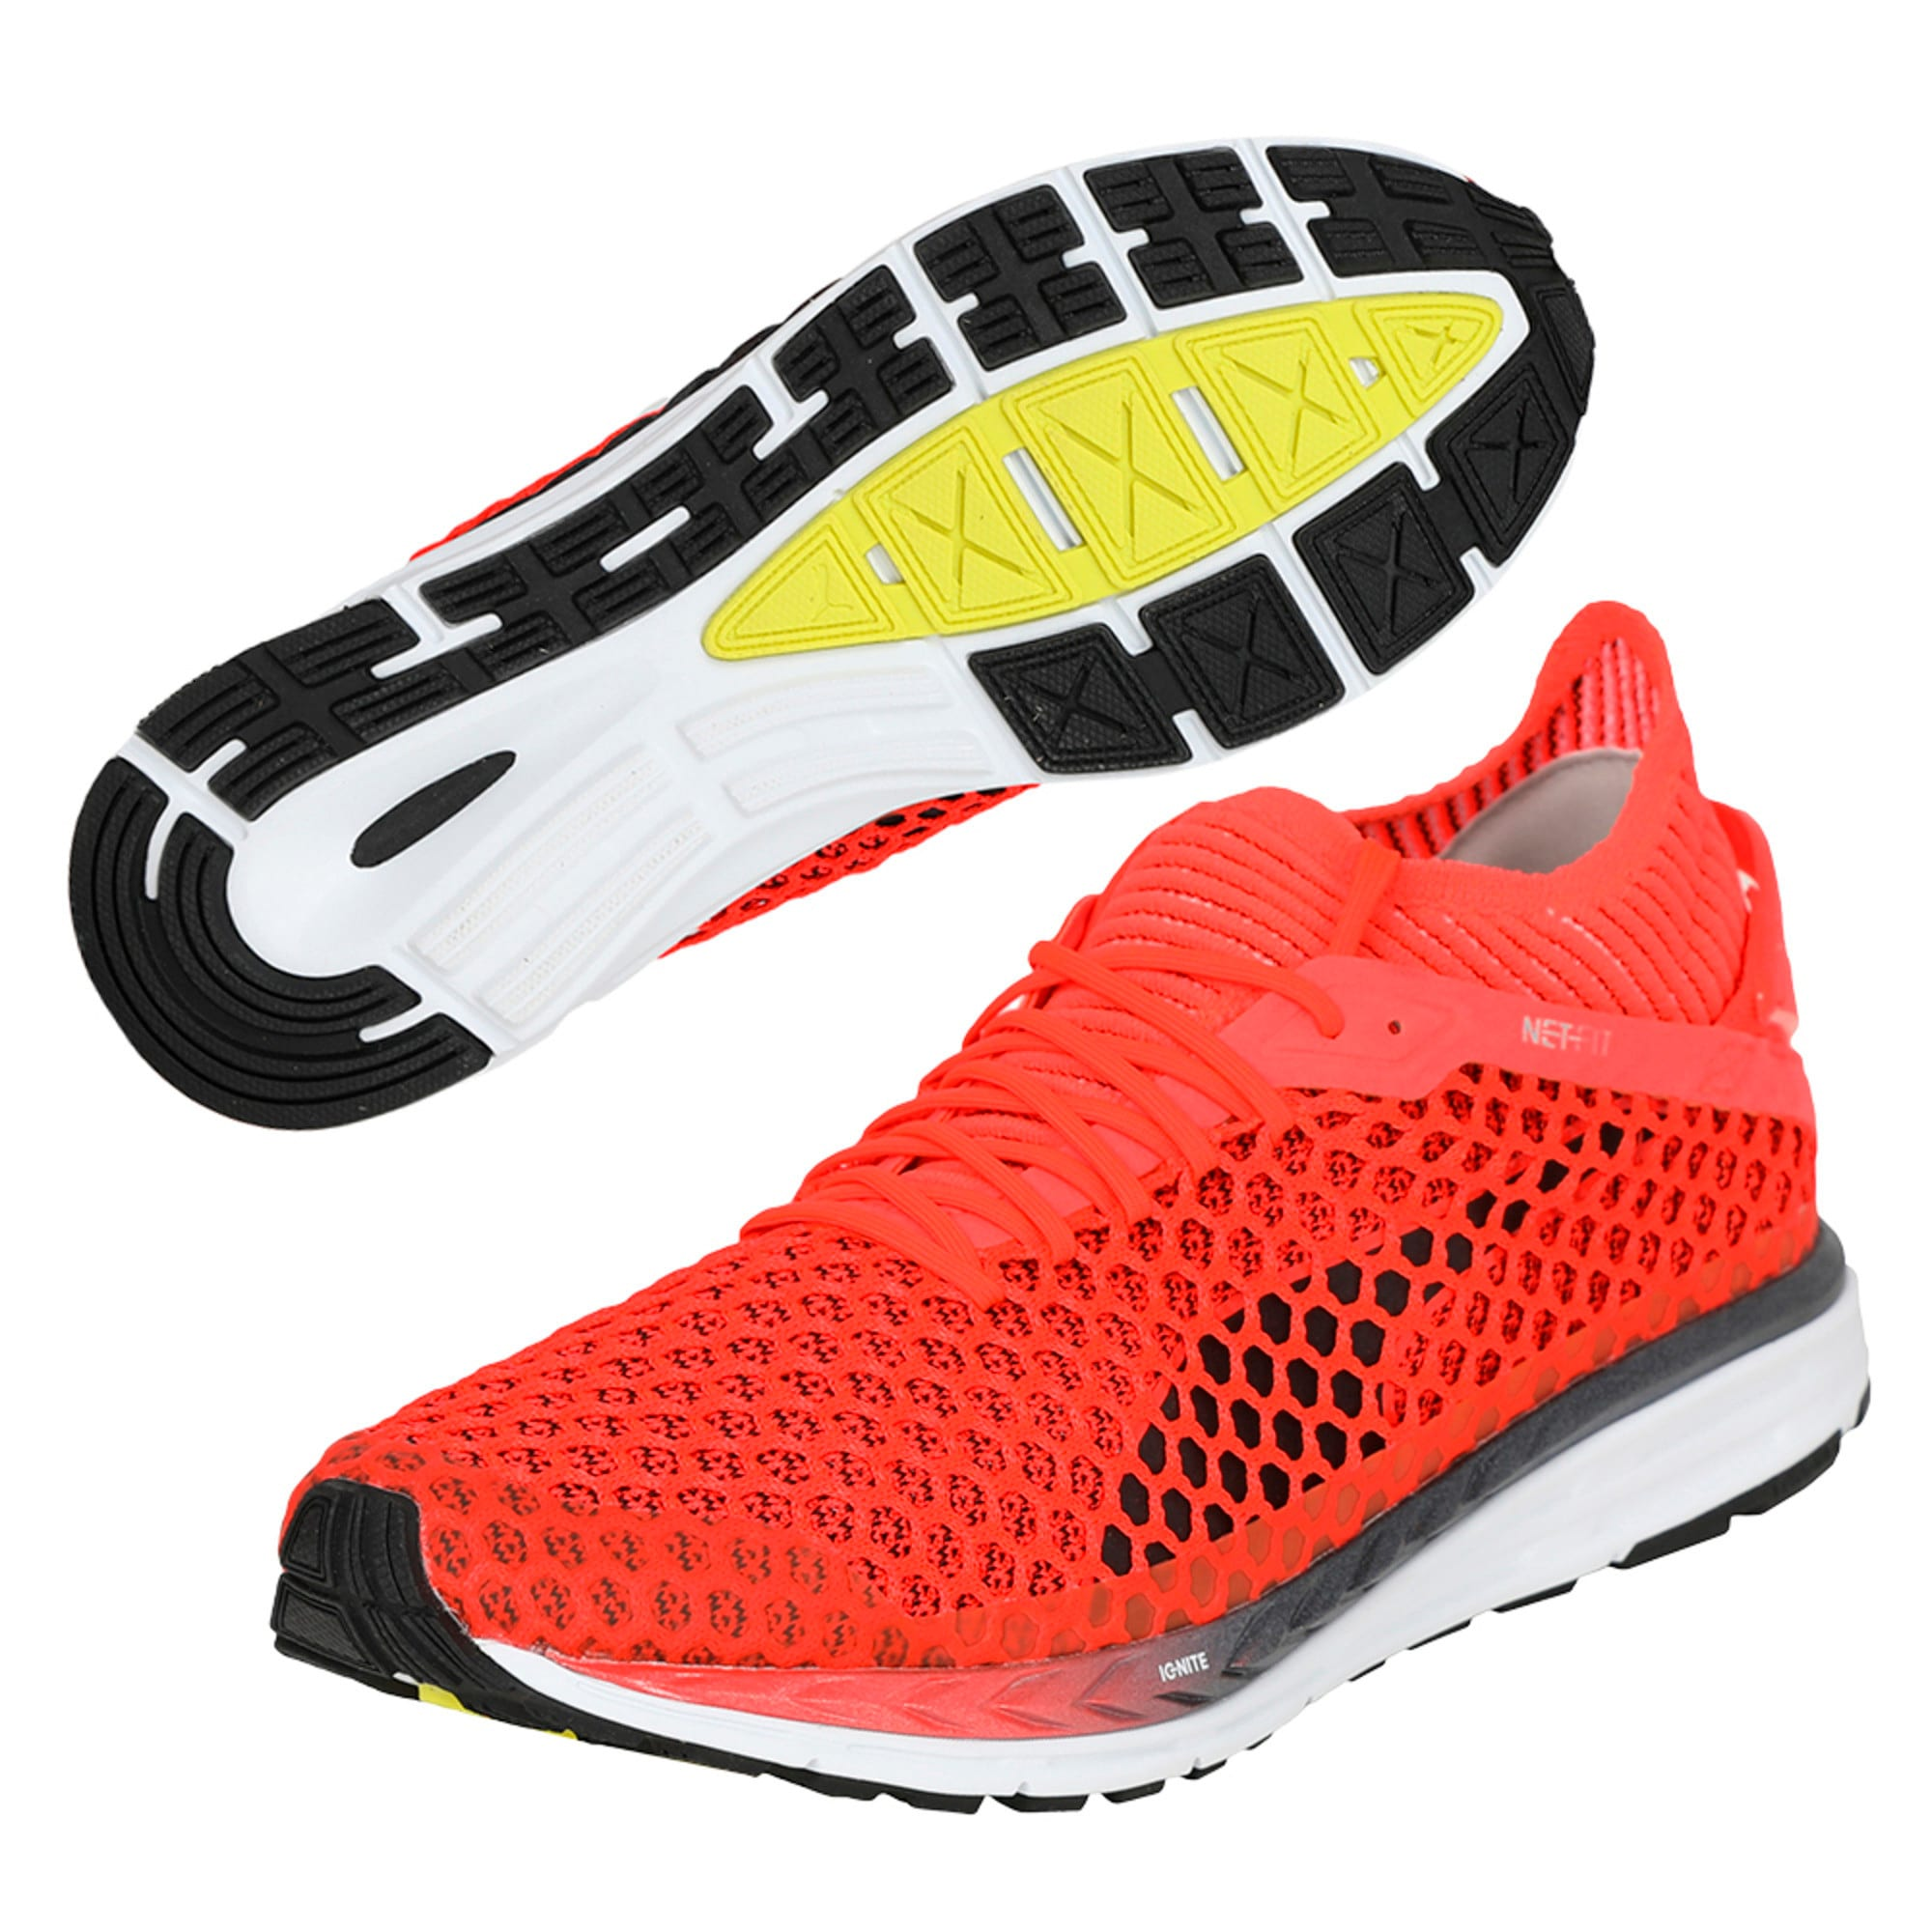 Thumbnail 6 of Speed IGNITE NETFIT 2 Men's Running Shoes, Red Blast-White-Black, medium-IND